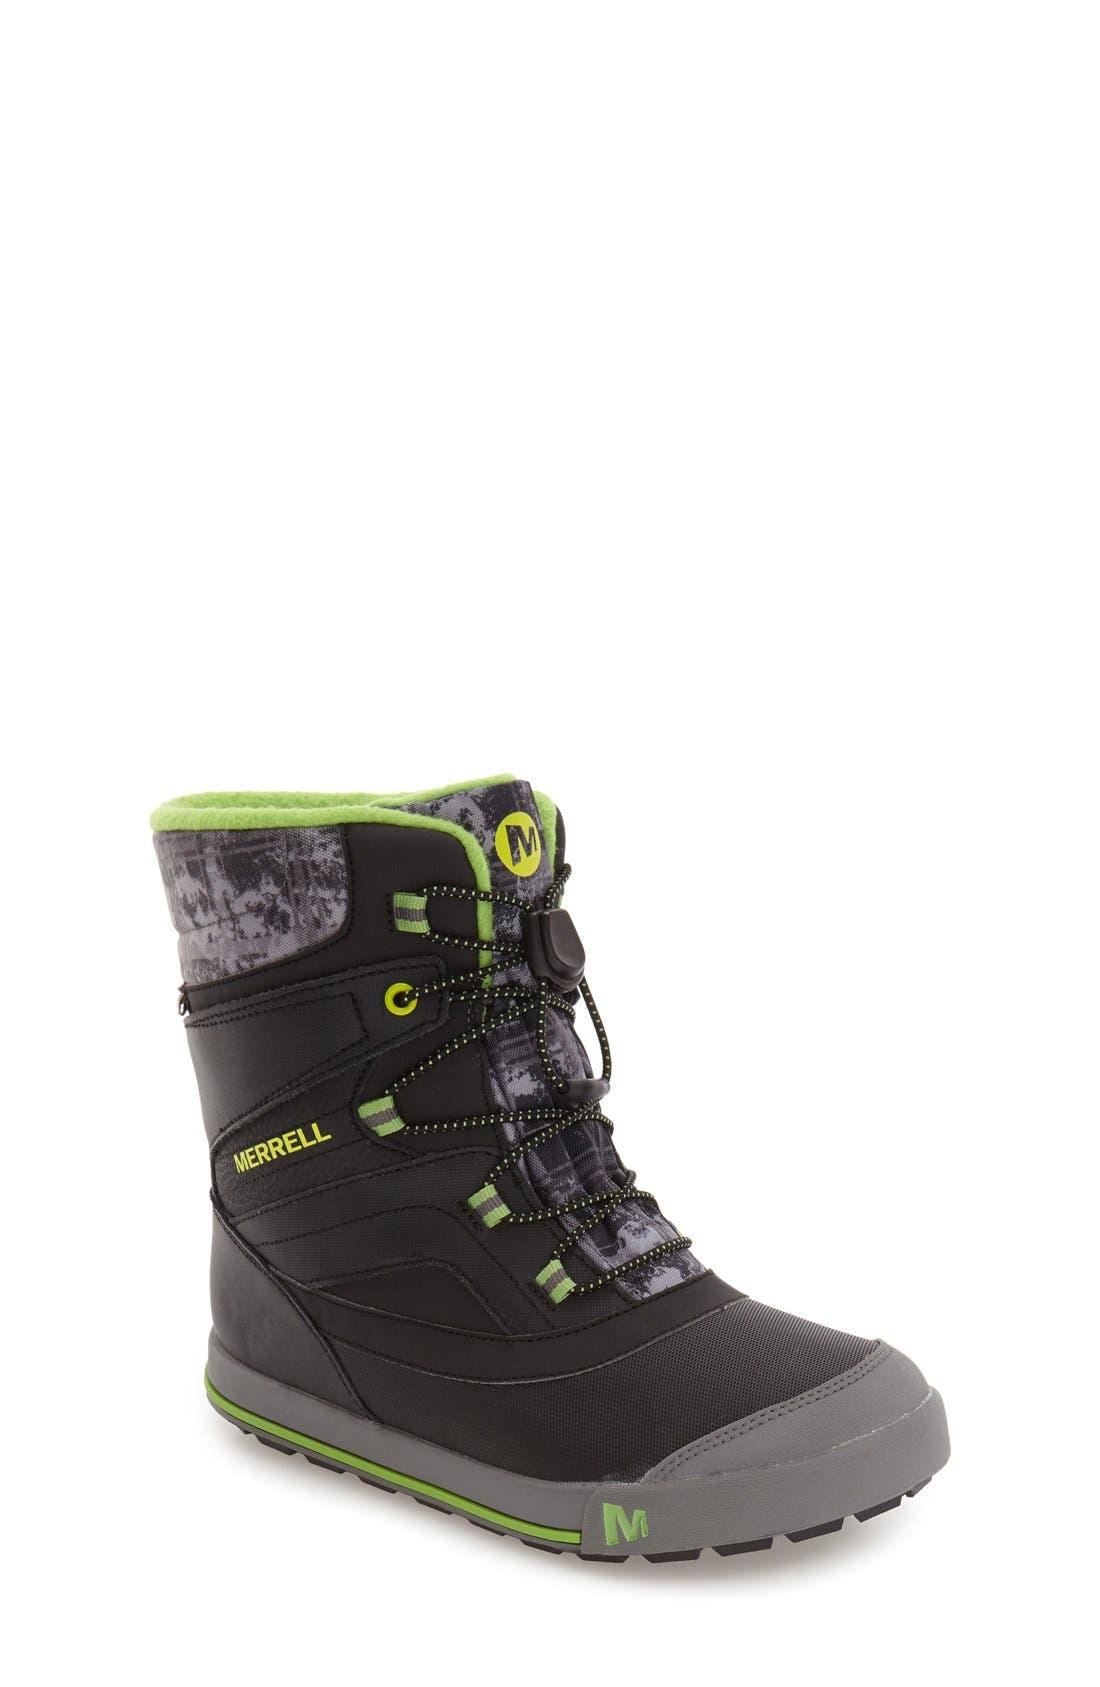 MERRELL 'Snow Bank 2' Waterproof Boot, Main, color, 001